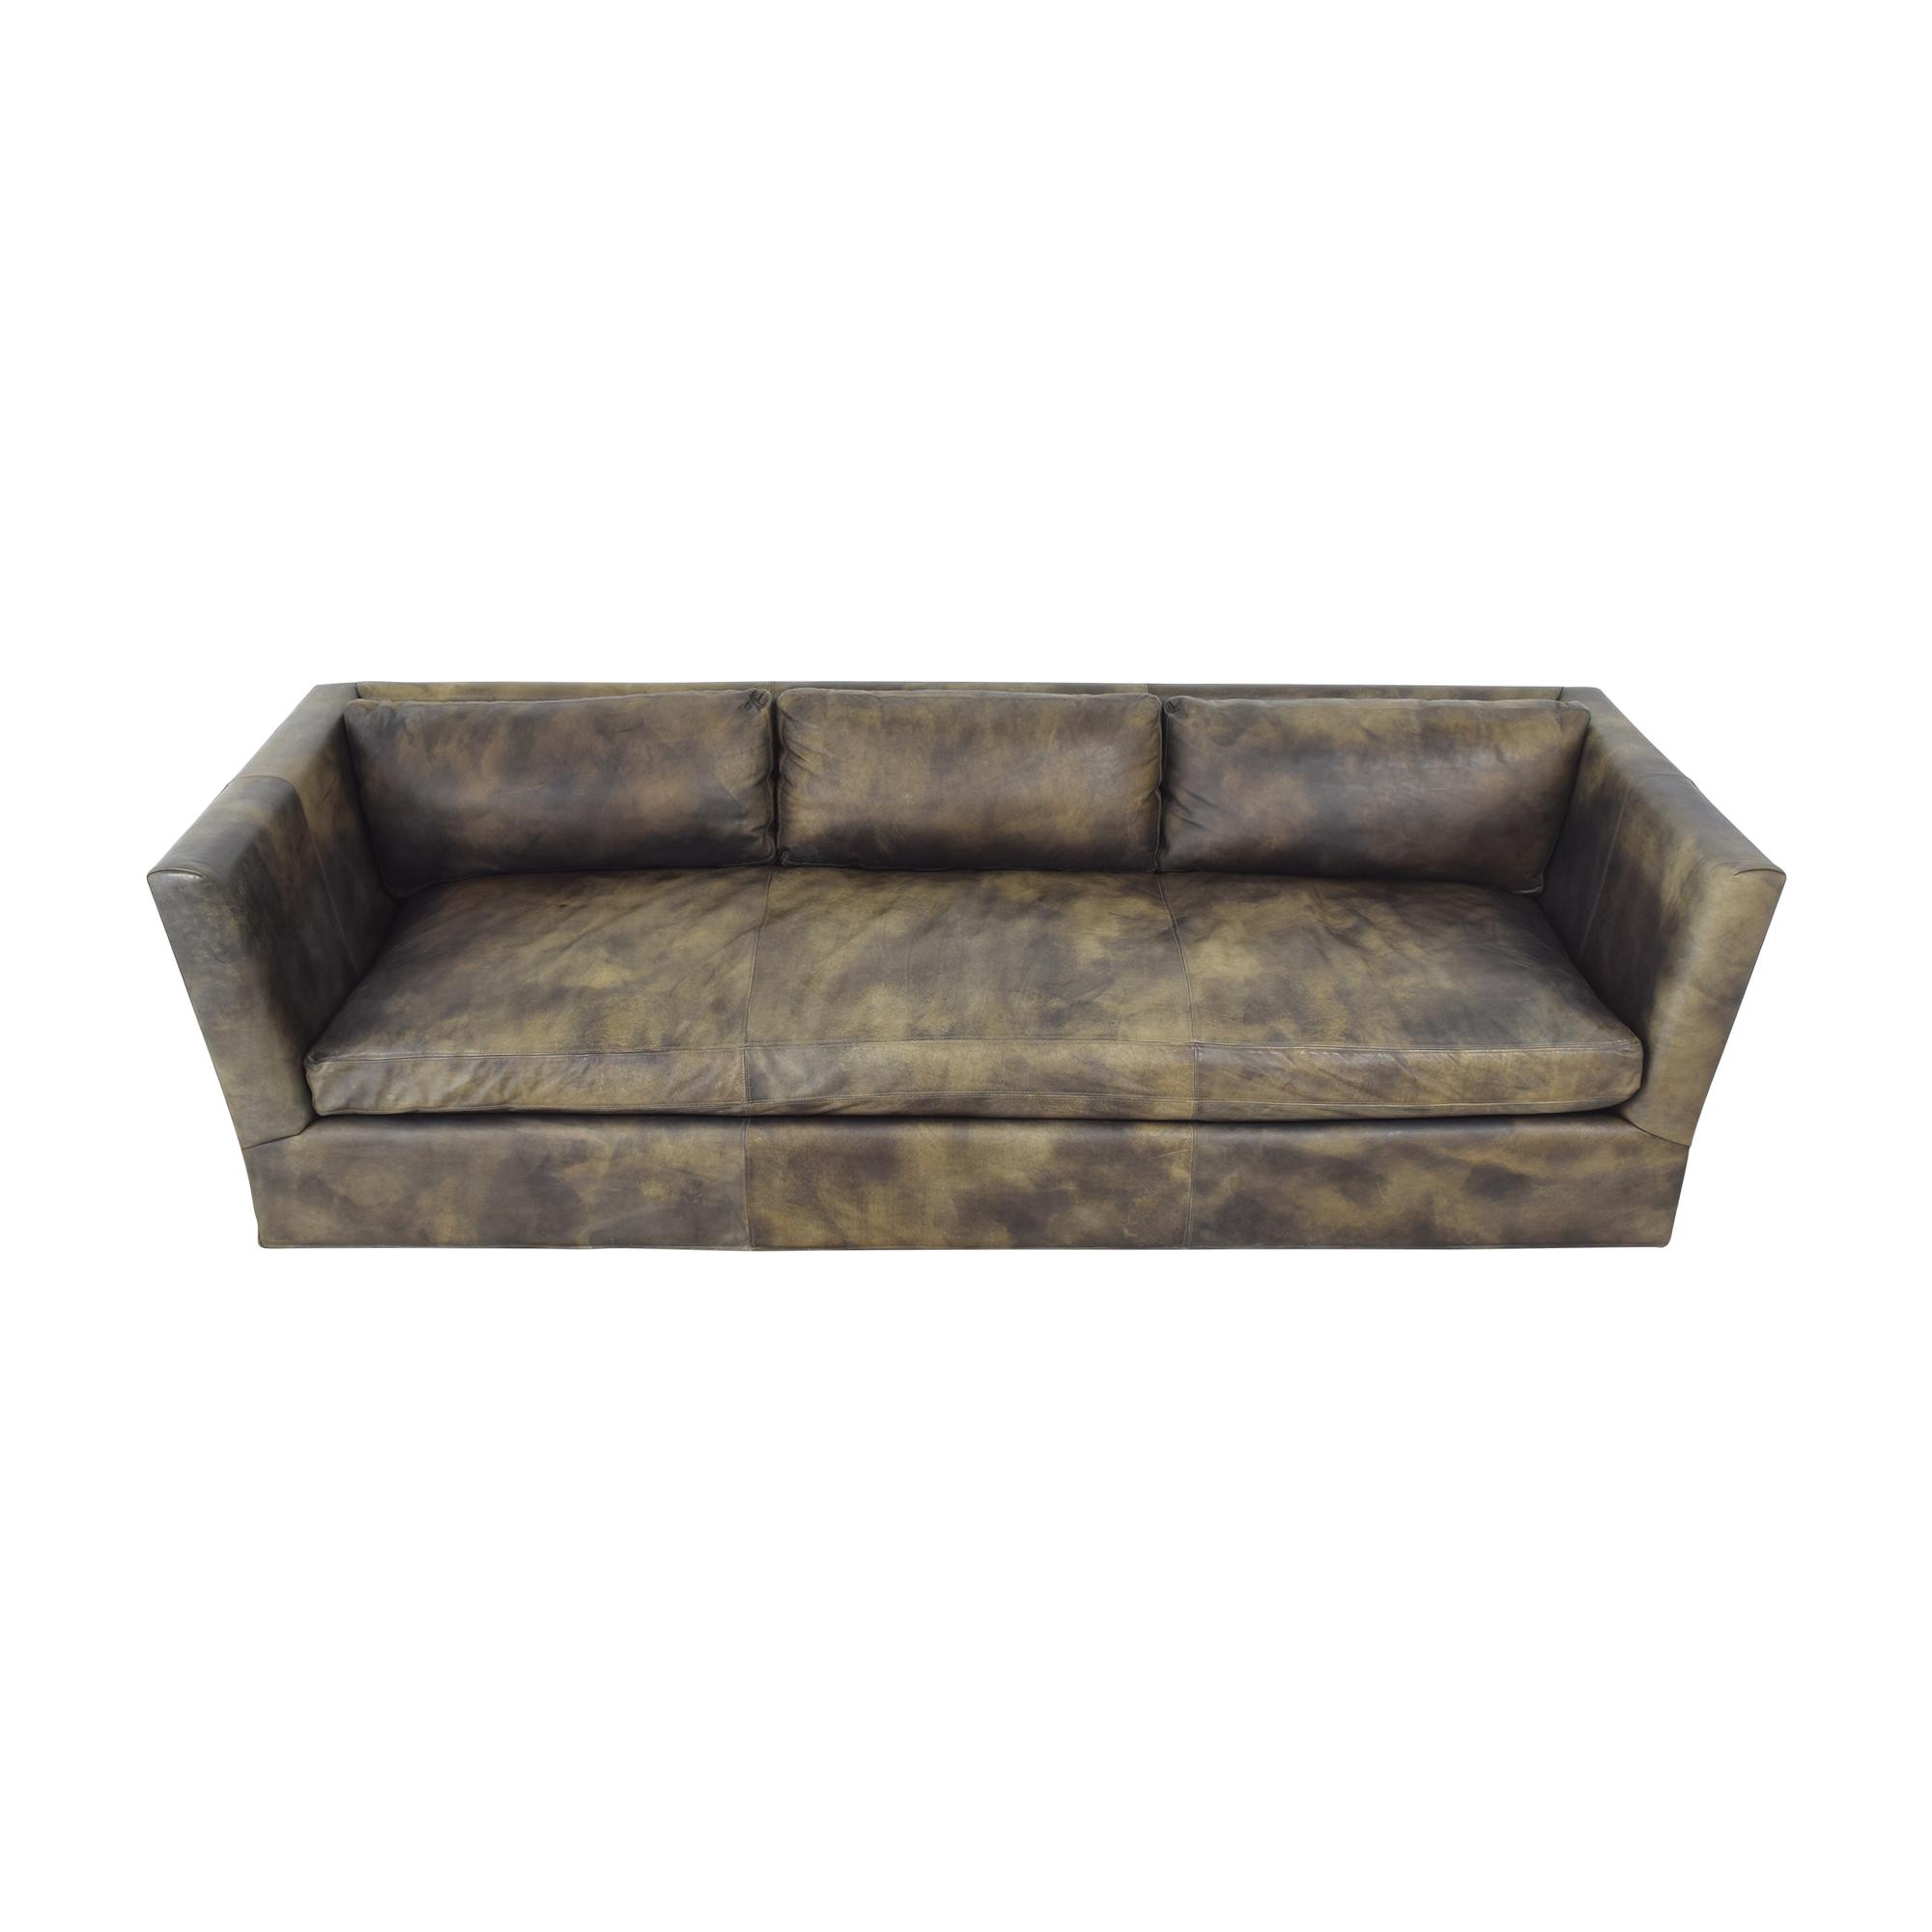 Restoration Hardware Custom Flared Arm Sofa / Classic Sofas